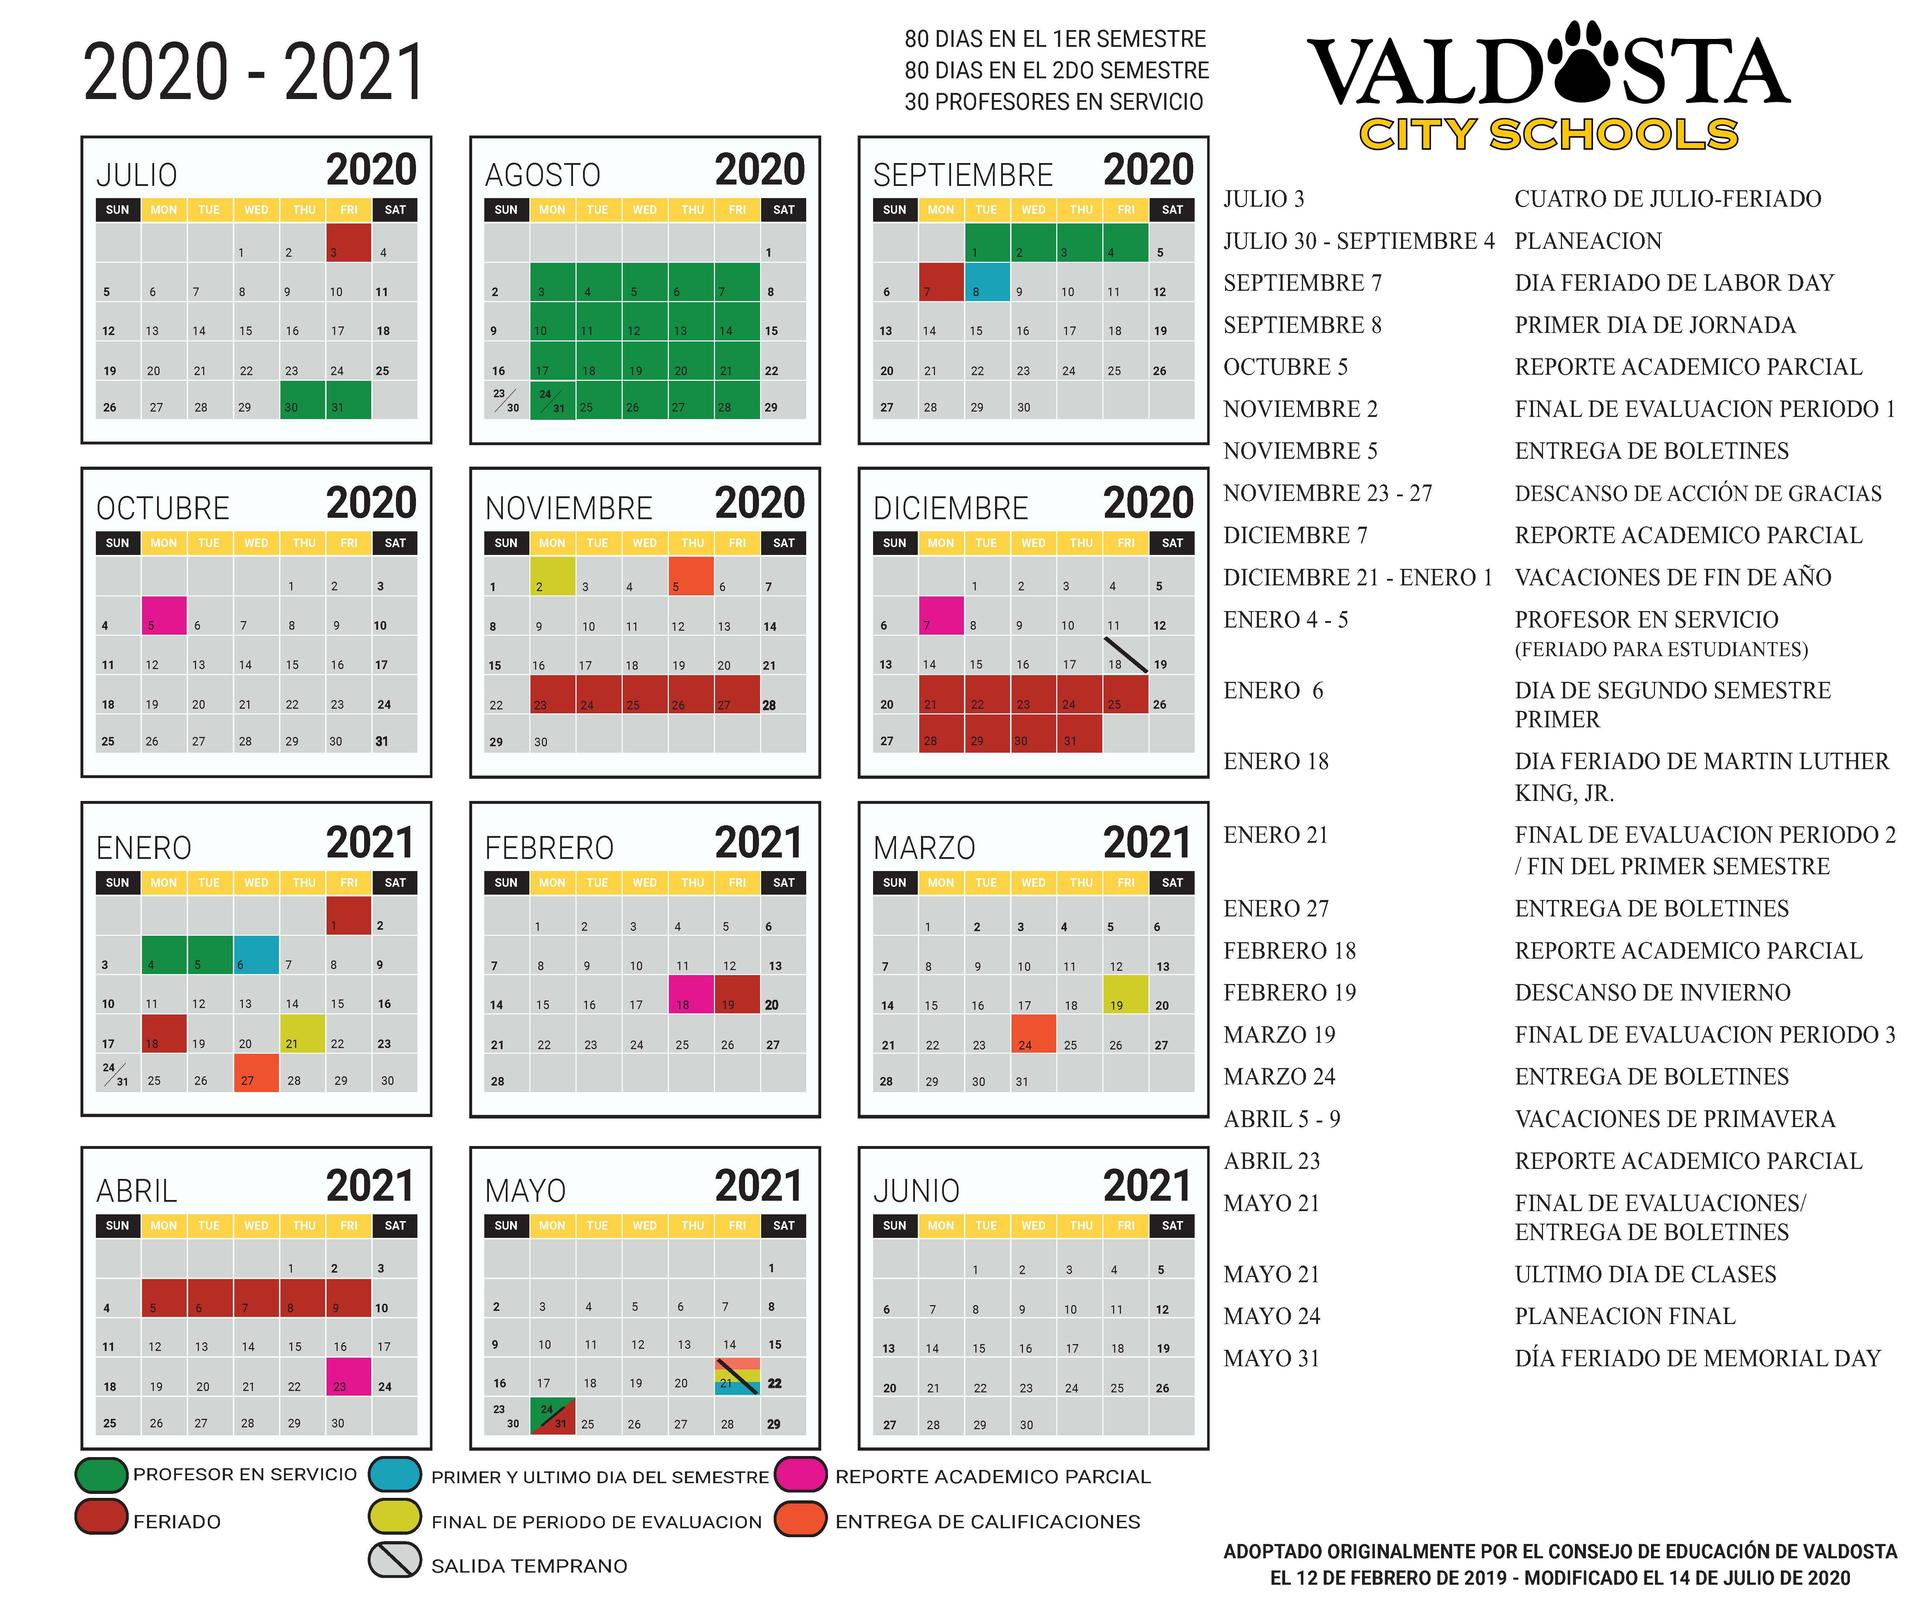 Uga Academic Calendar 2021 2022